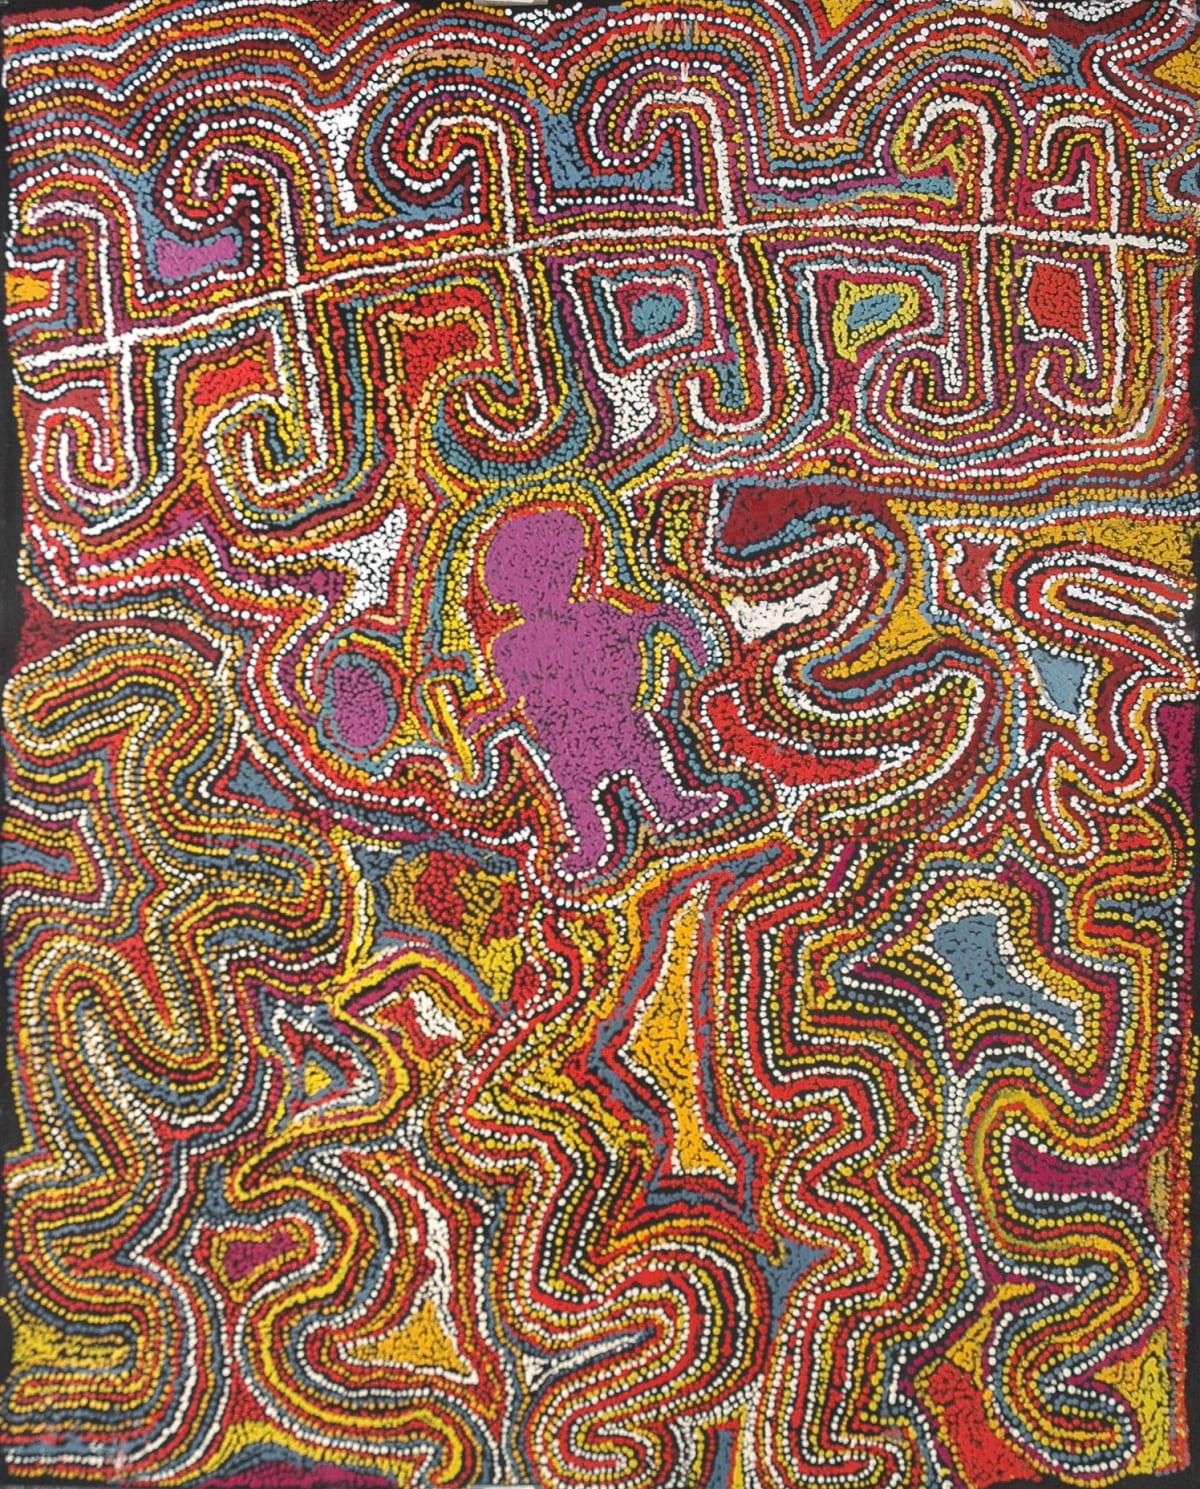 Kathleen Tjapalyi Minyma mamu acrylic on canvas 121 x 152 cm